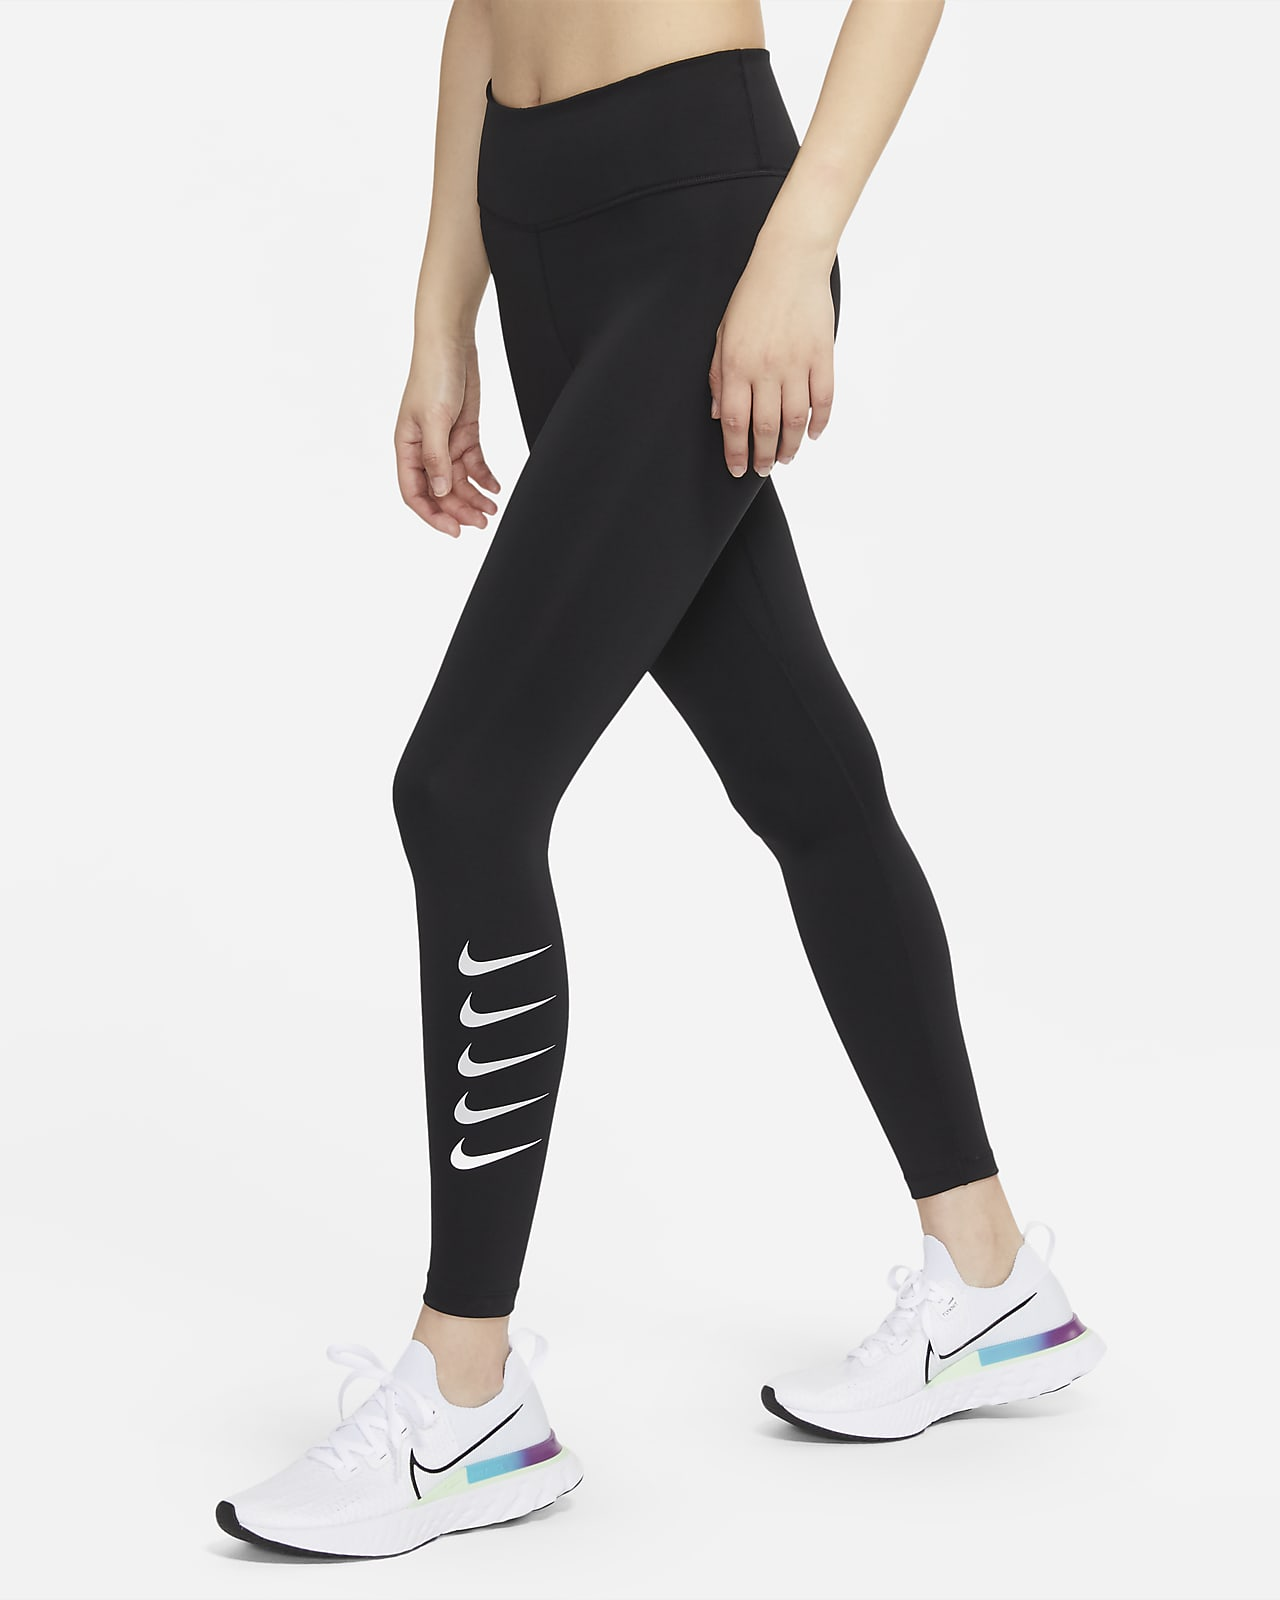 Nike Swoosh Run 7/8 女子中腰跑步紧身裤